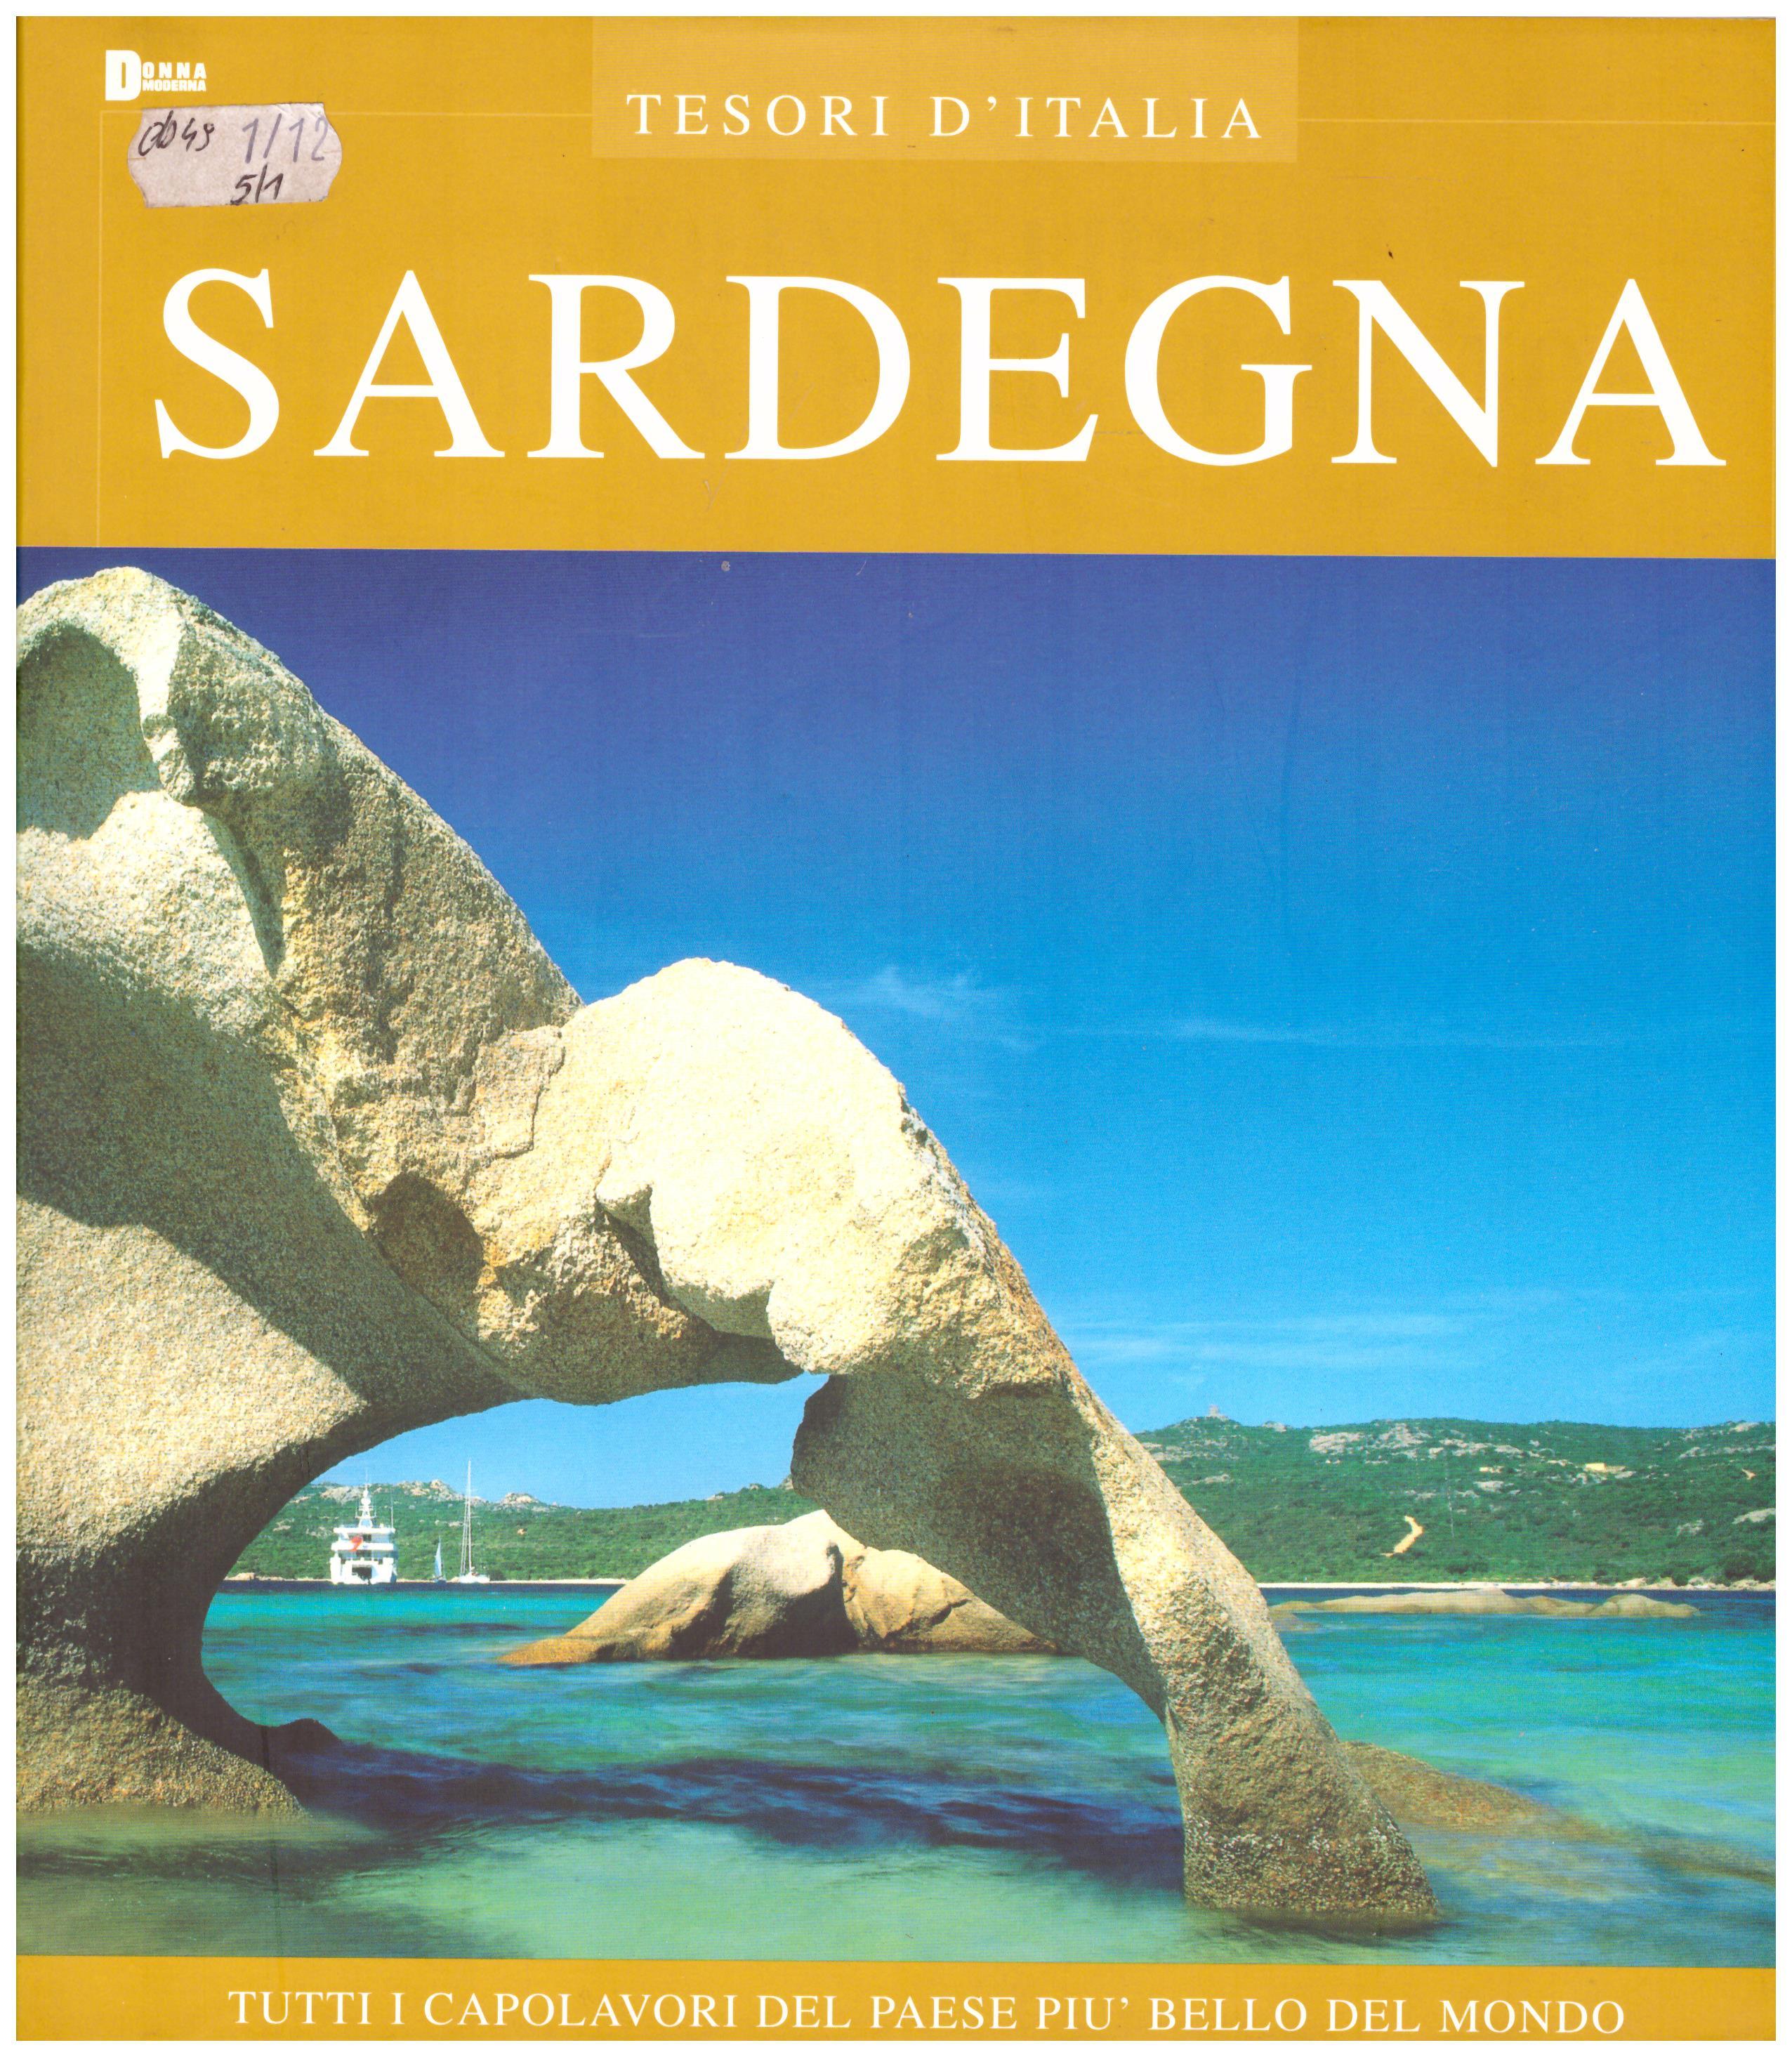 Titolo: Tesori d'Italia, Sardegna Autore : AA.VV.   Editore: euroed 2004